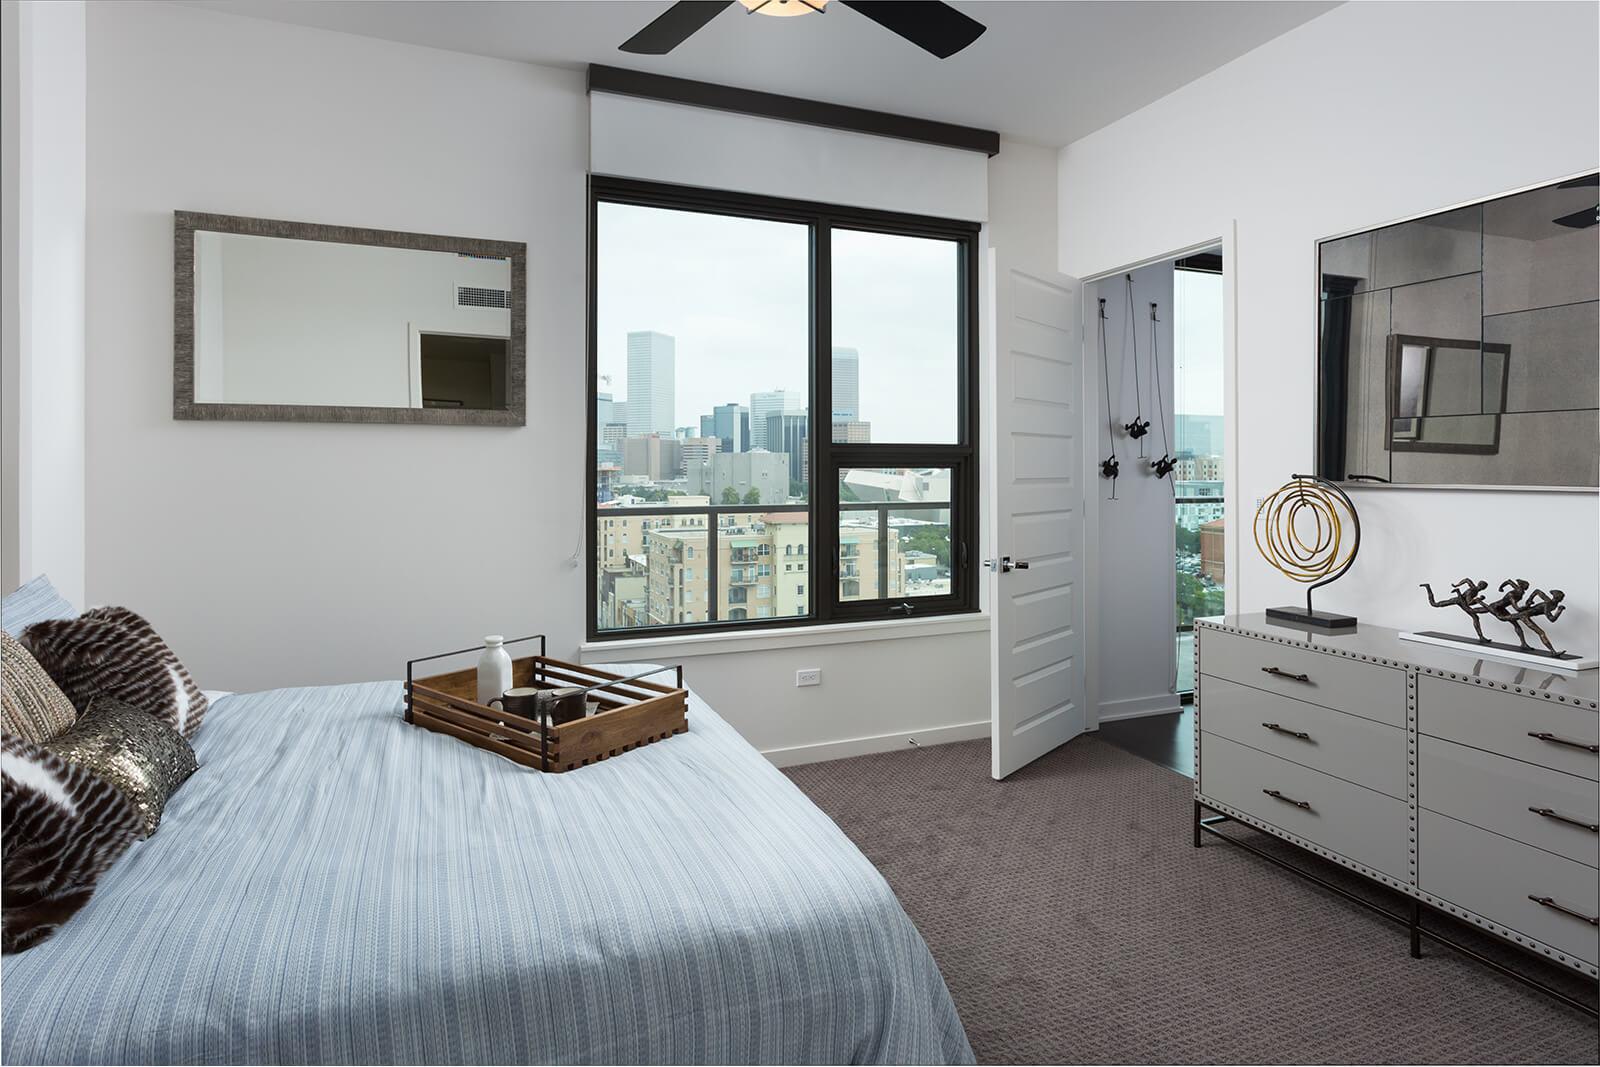 Ceiling Fans in All Apartments at 1000 Speer by Windsor, 1000 Speer Blvd., Denver